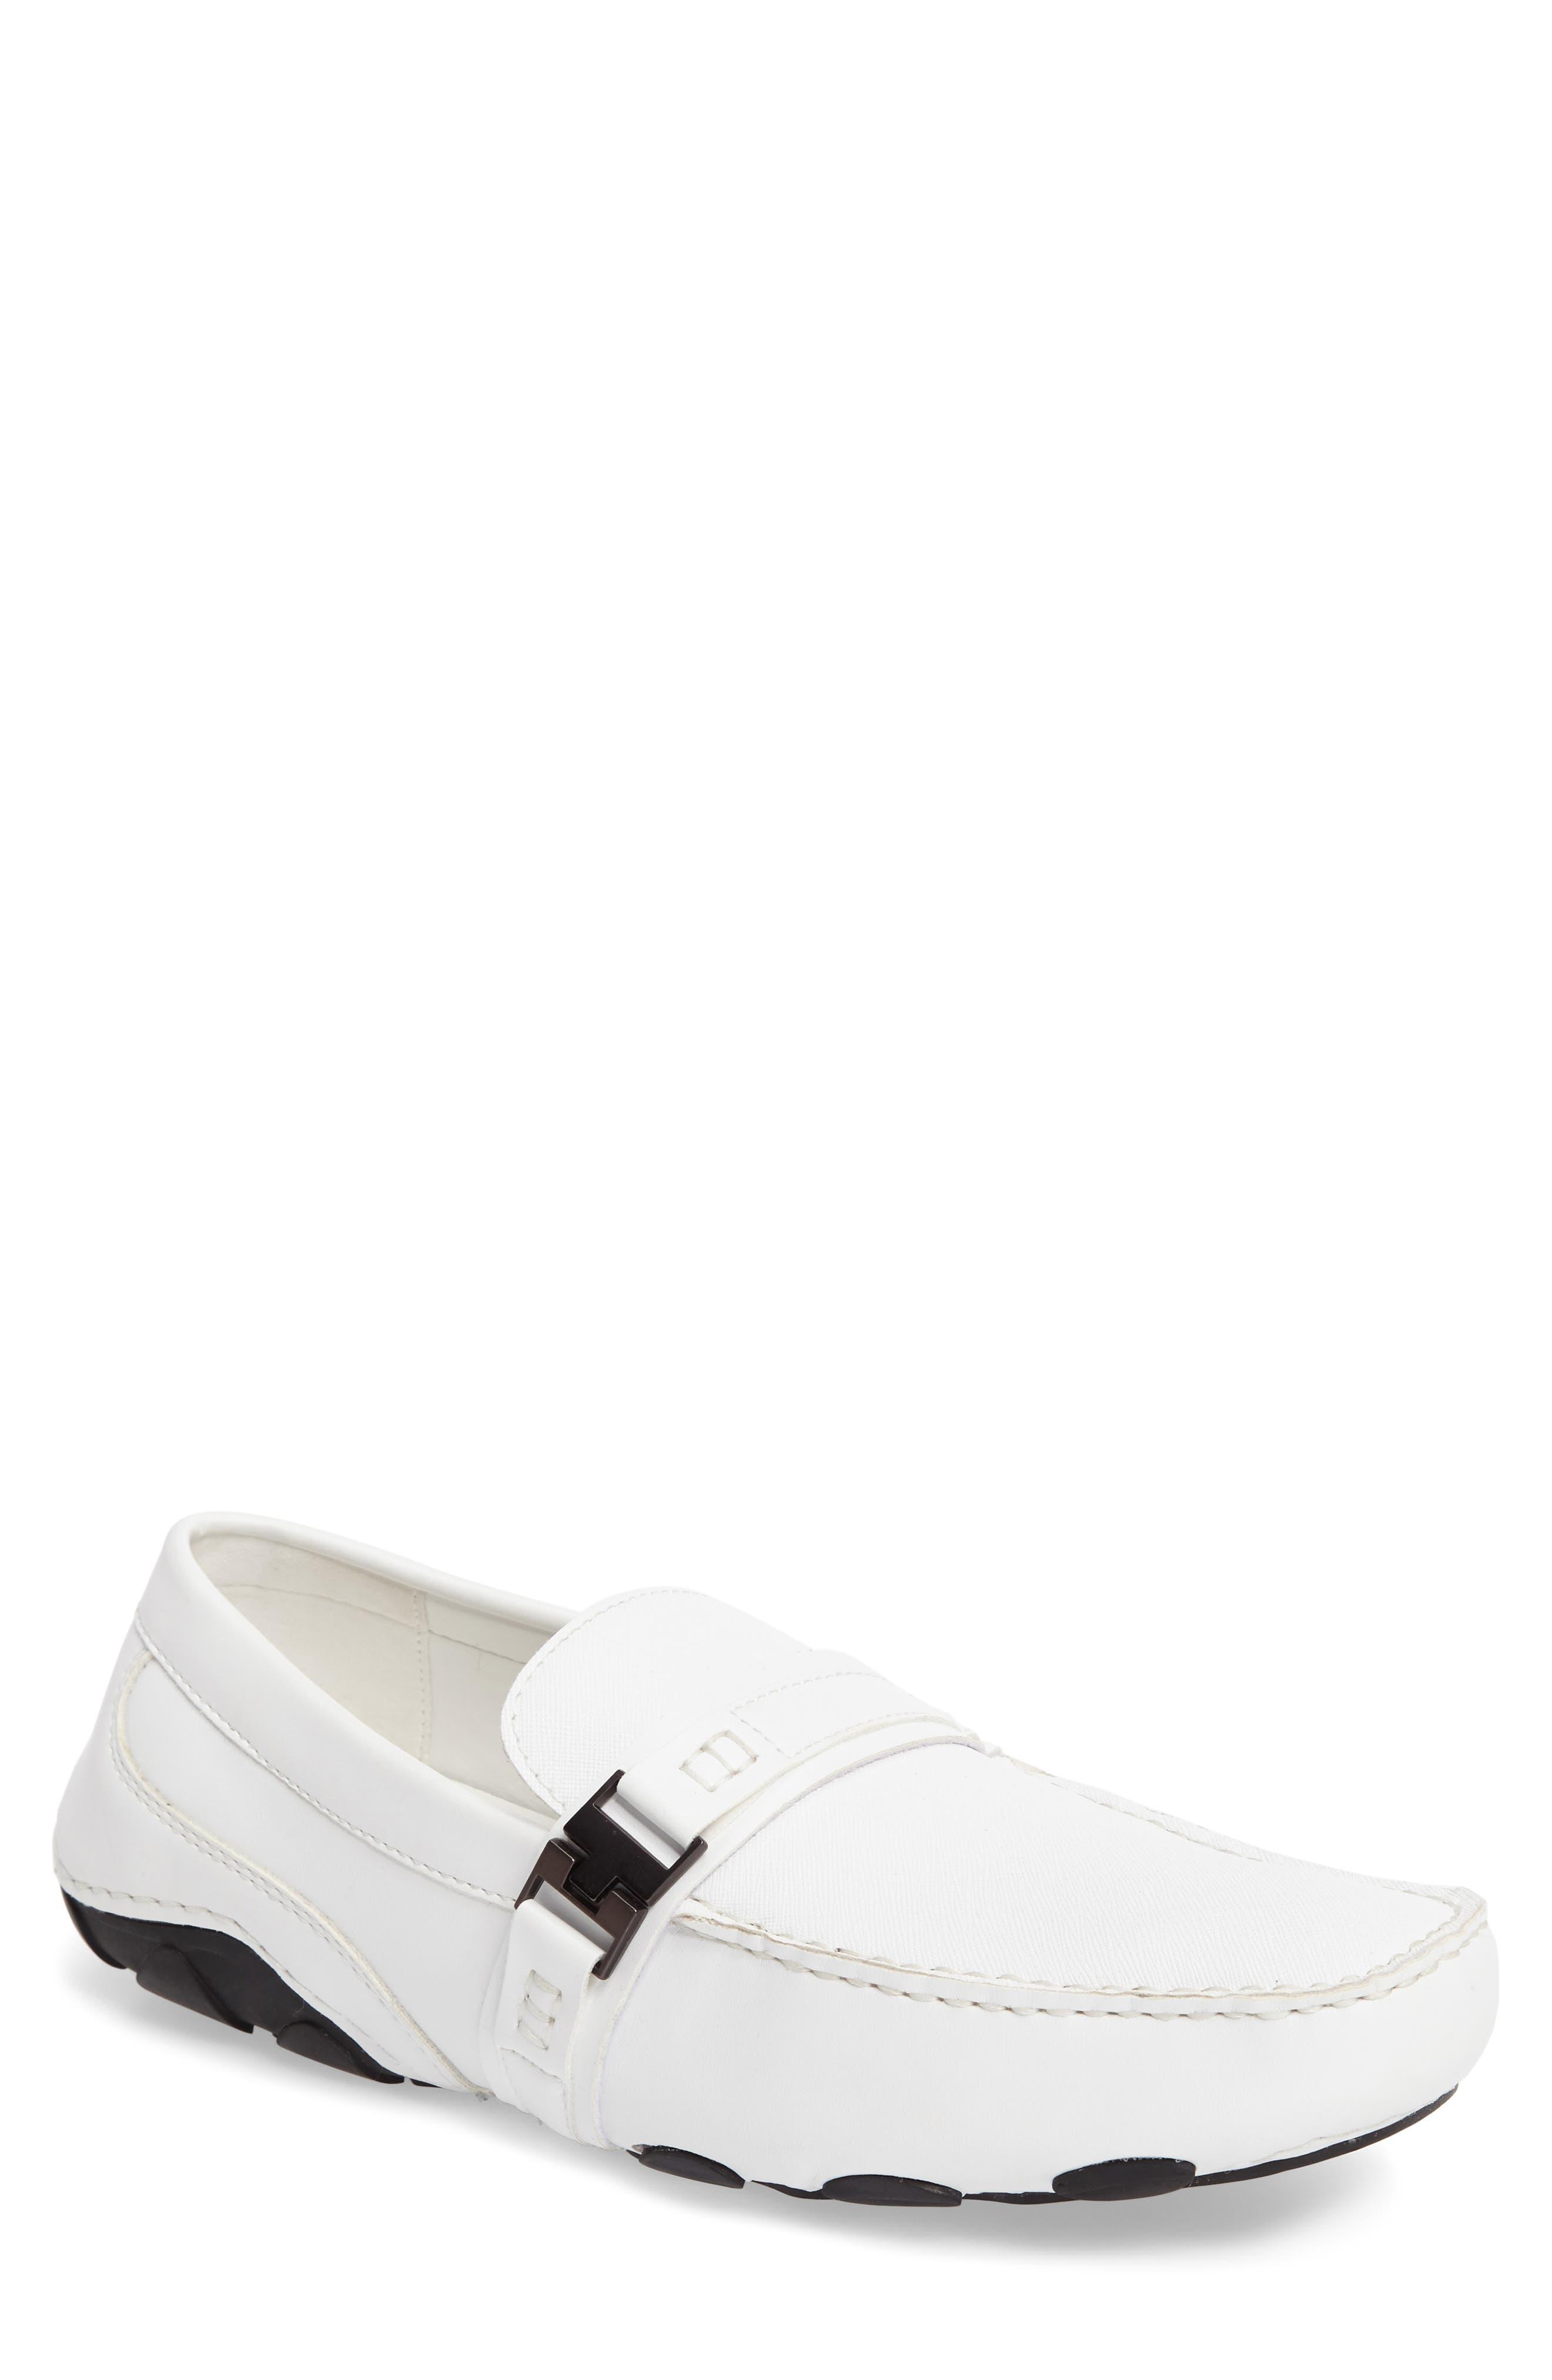 'Toast 2 Me' Driving Shoe,                             Main thumbnail 1, color,                             White Leather